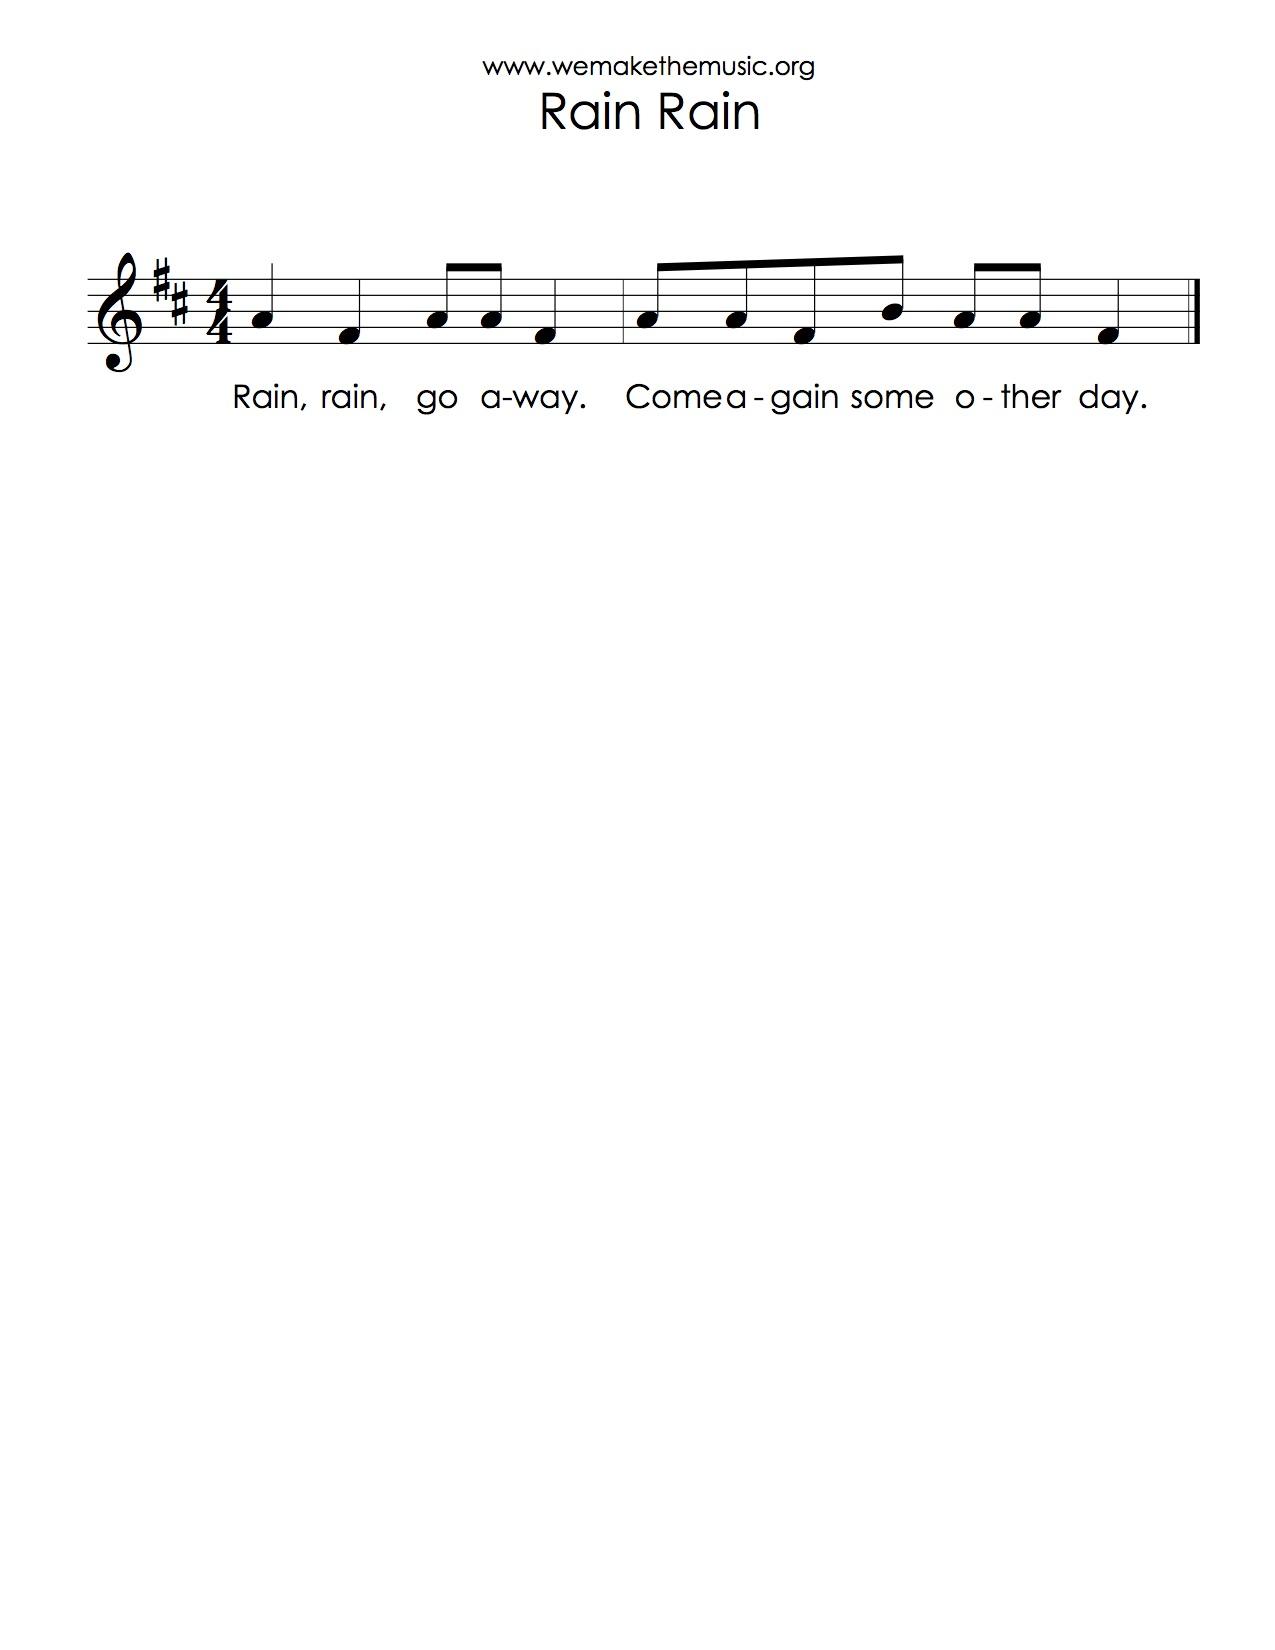 Rain Rain Sheet Music.jpg